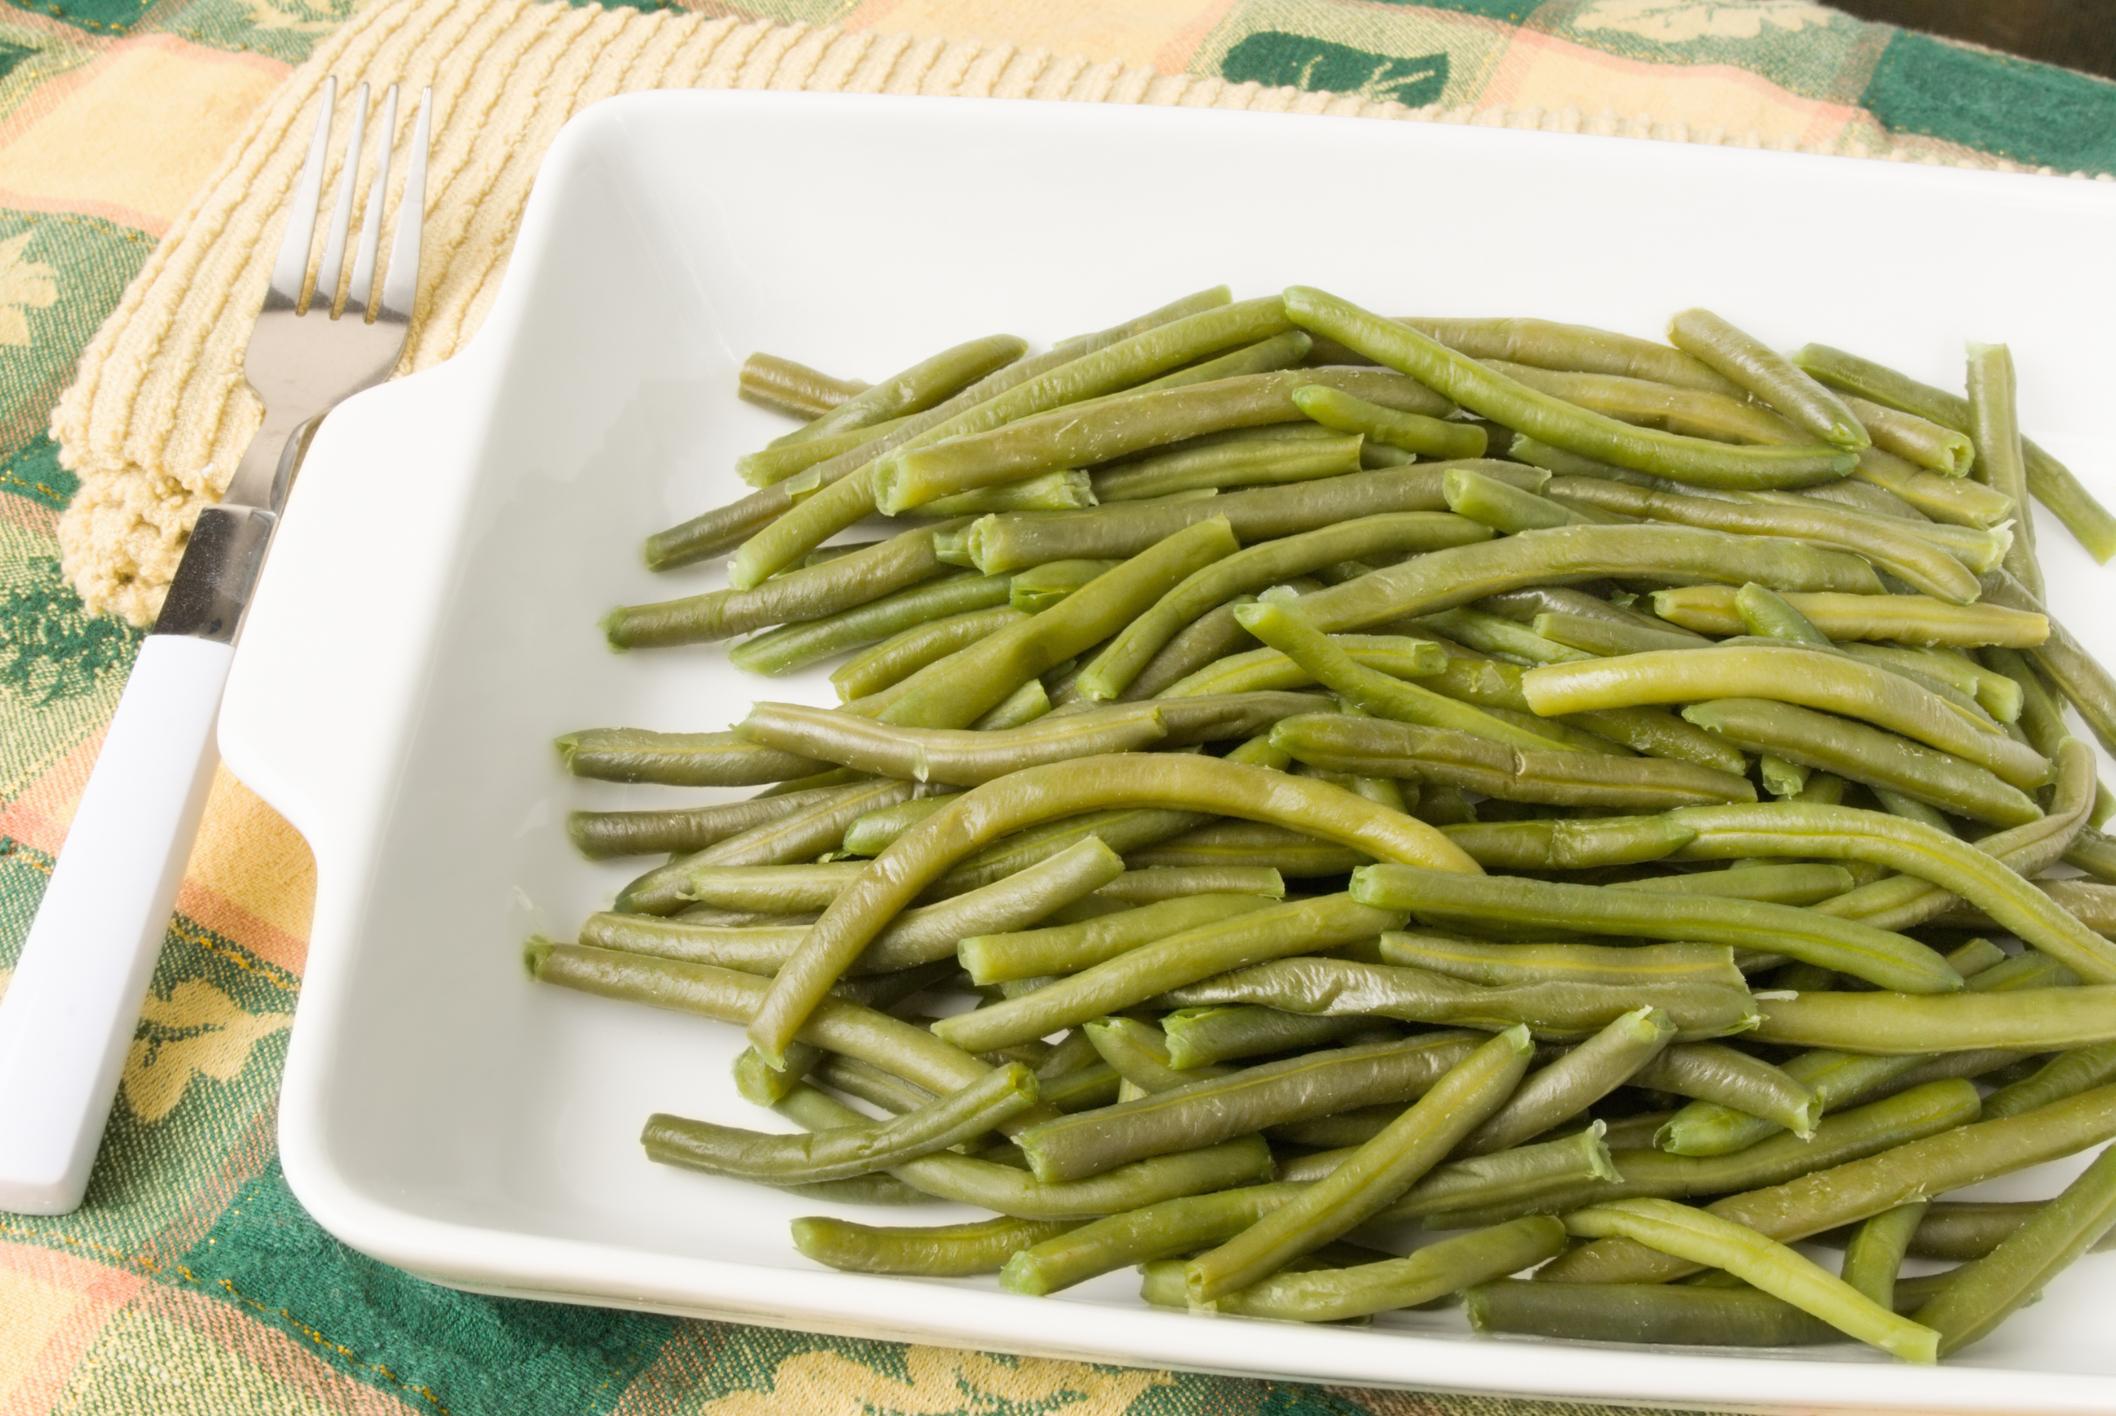 Steamed Green Beans 064H070-6855